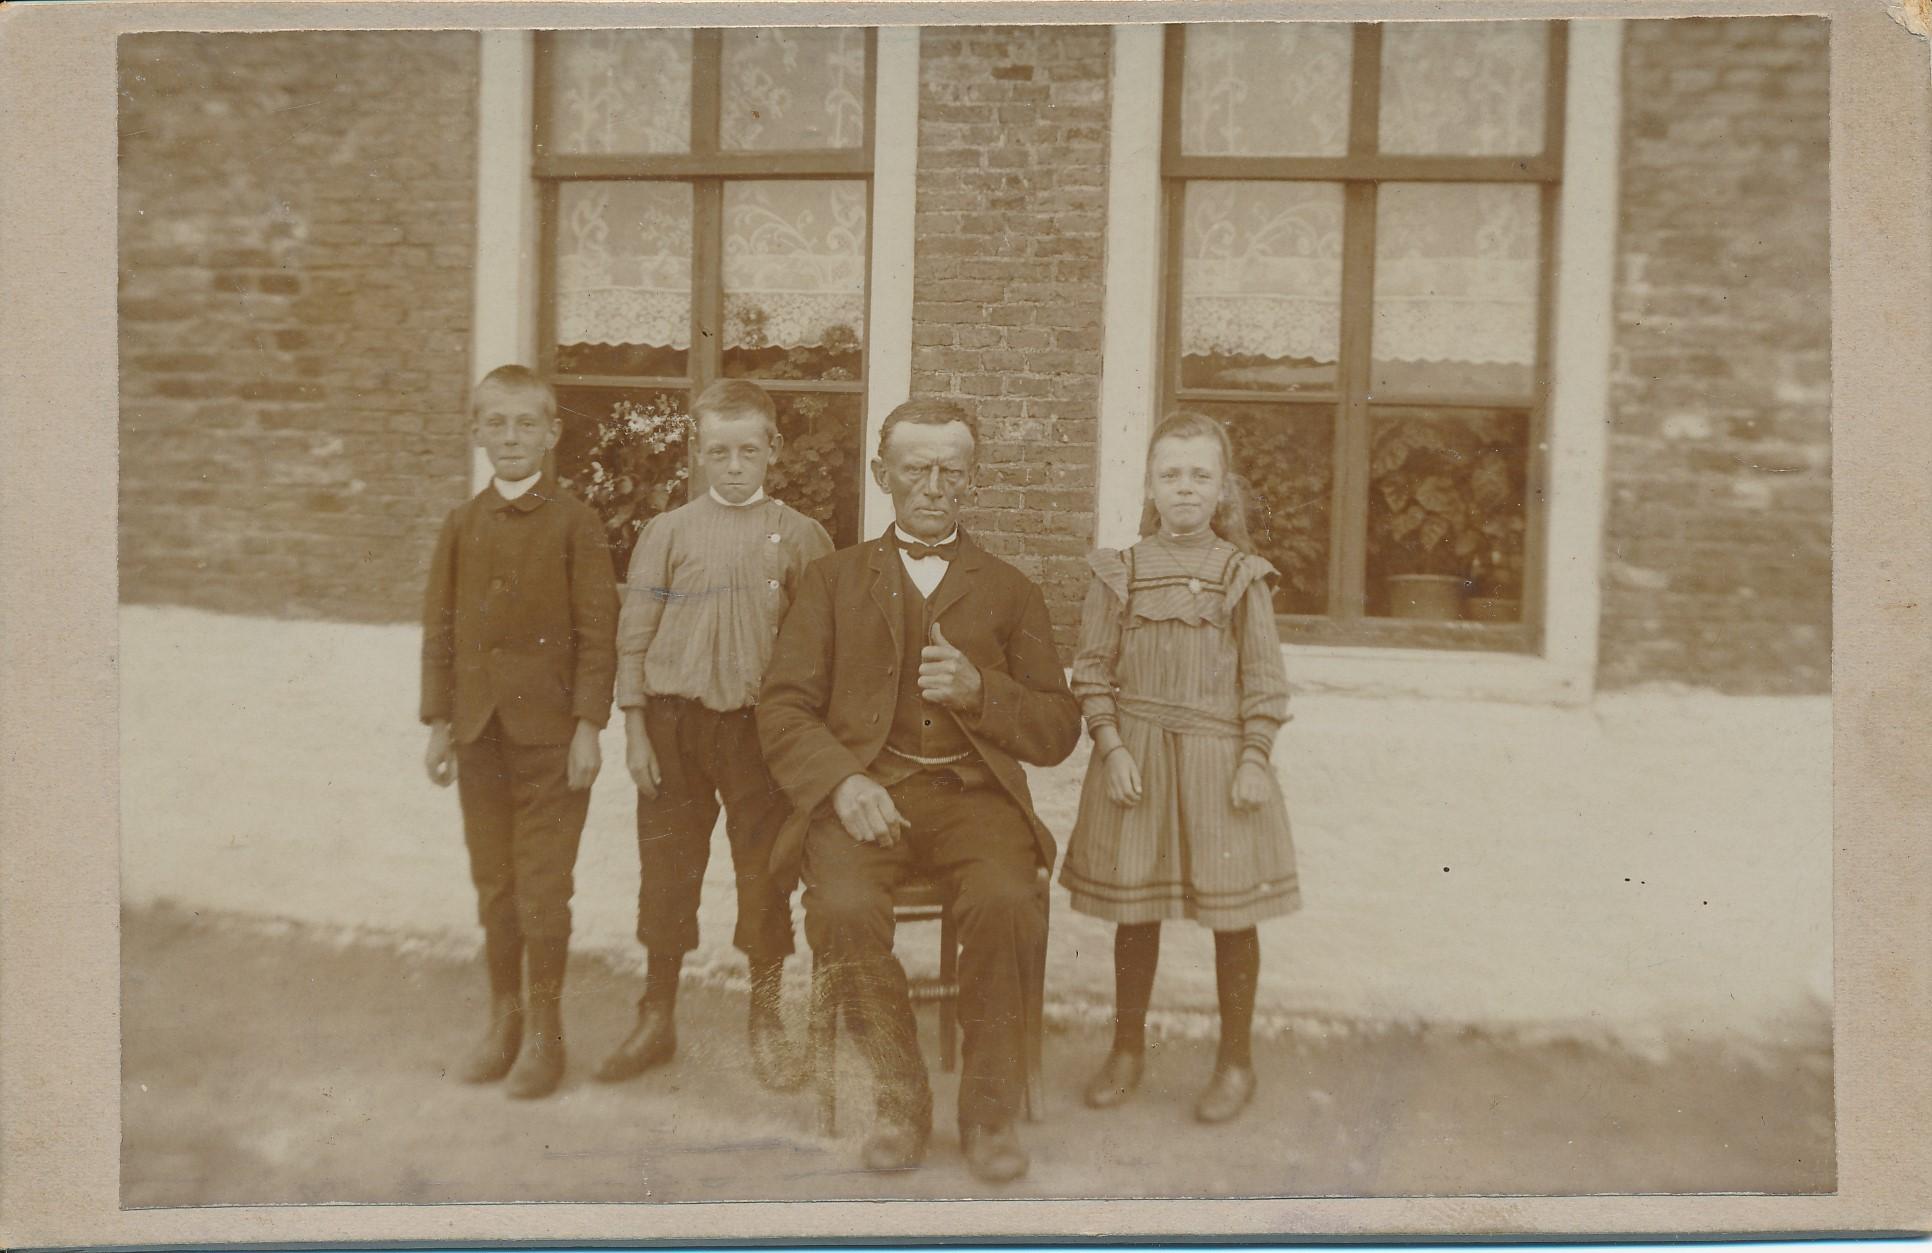 Fotoalbum Andre Kamsma, 116, hus op de hoekje (Hinse en Janke Weiland), tusken Bootsma en A. Stoelinga, Andries Jacobus Kamsma, Bauke, Minicus en Hieke Kamsma, 1912